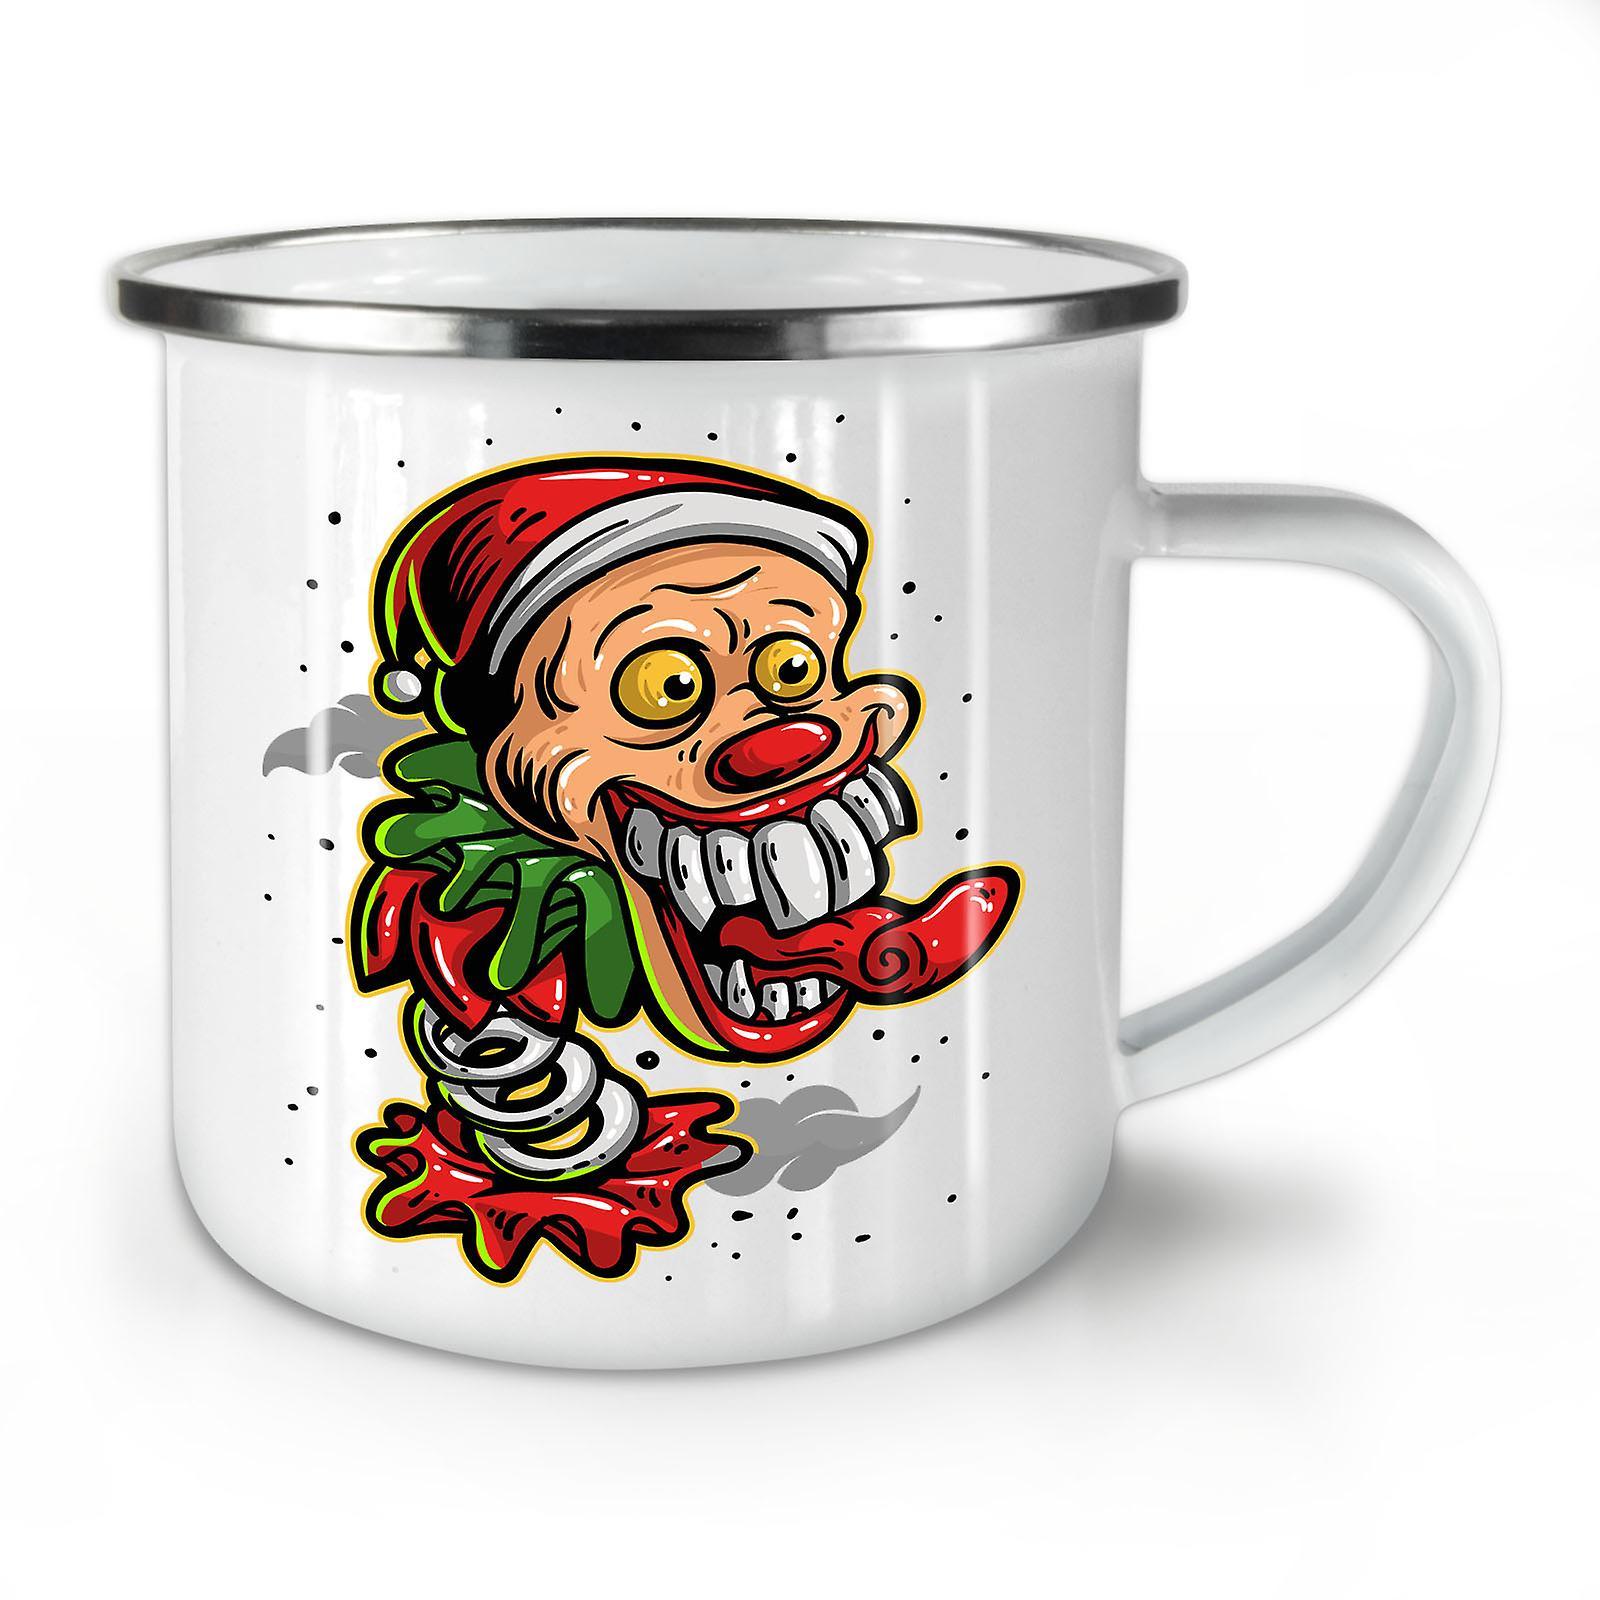 Clown Mug10 Nouveau Whitetea Café Christmas Émail OzWellcoda mwN8n0v